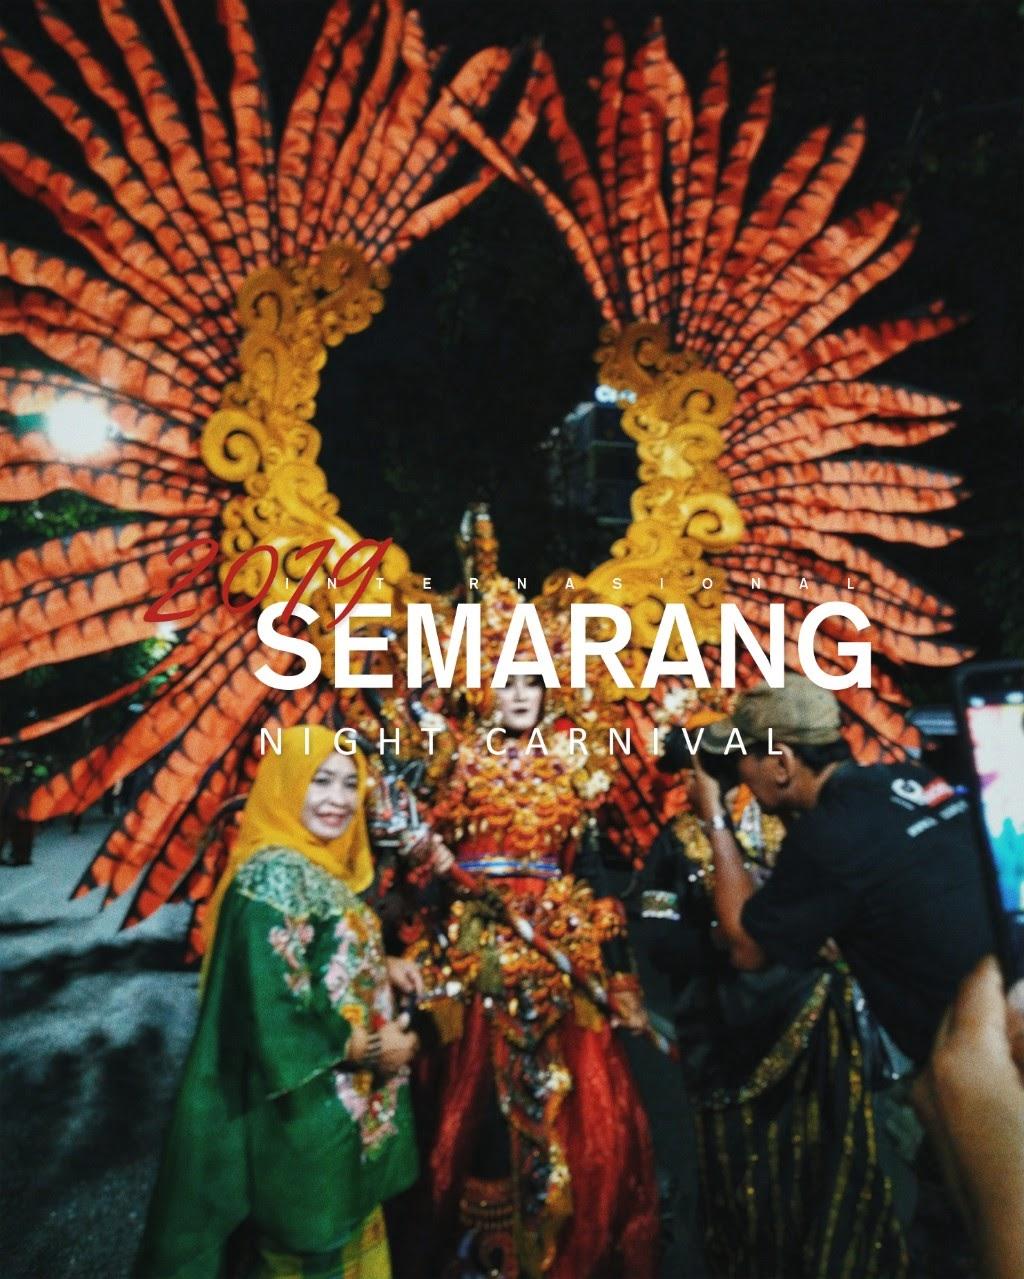 [Review Event] International Semarang Night Carnival 2019